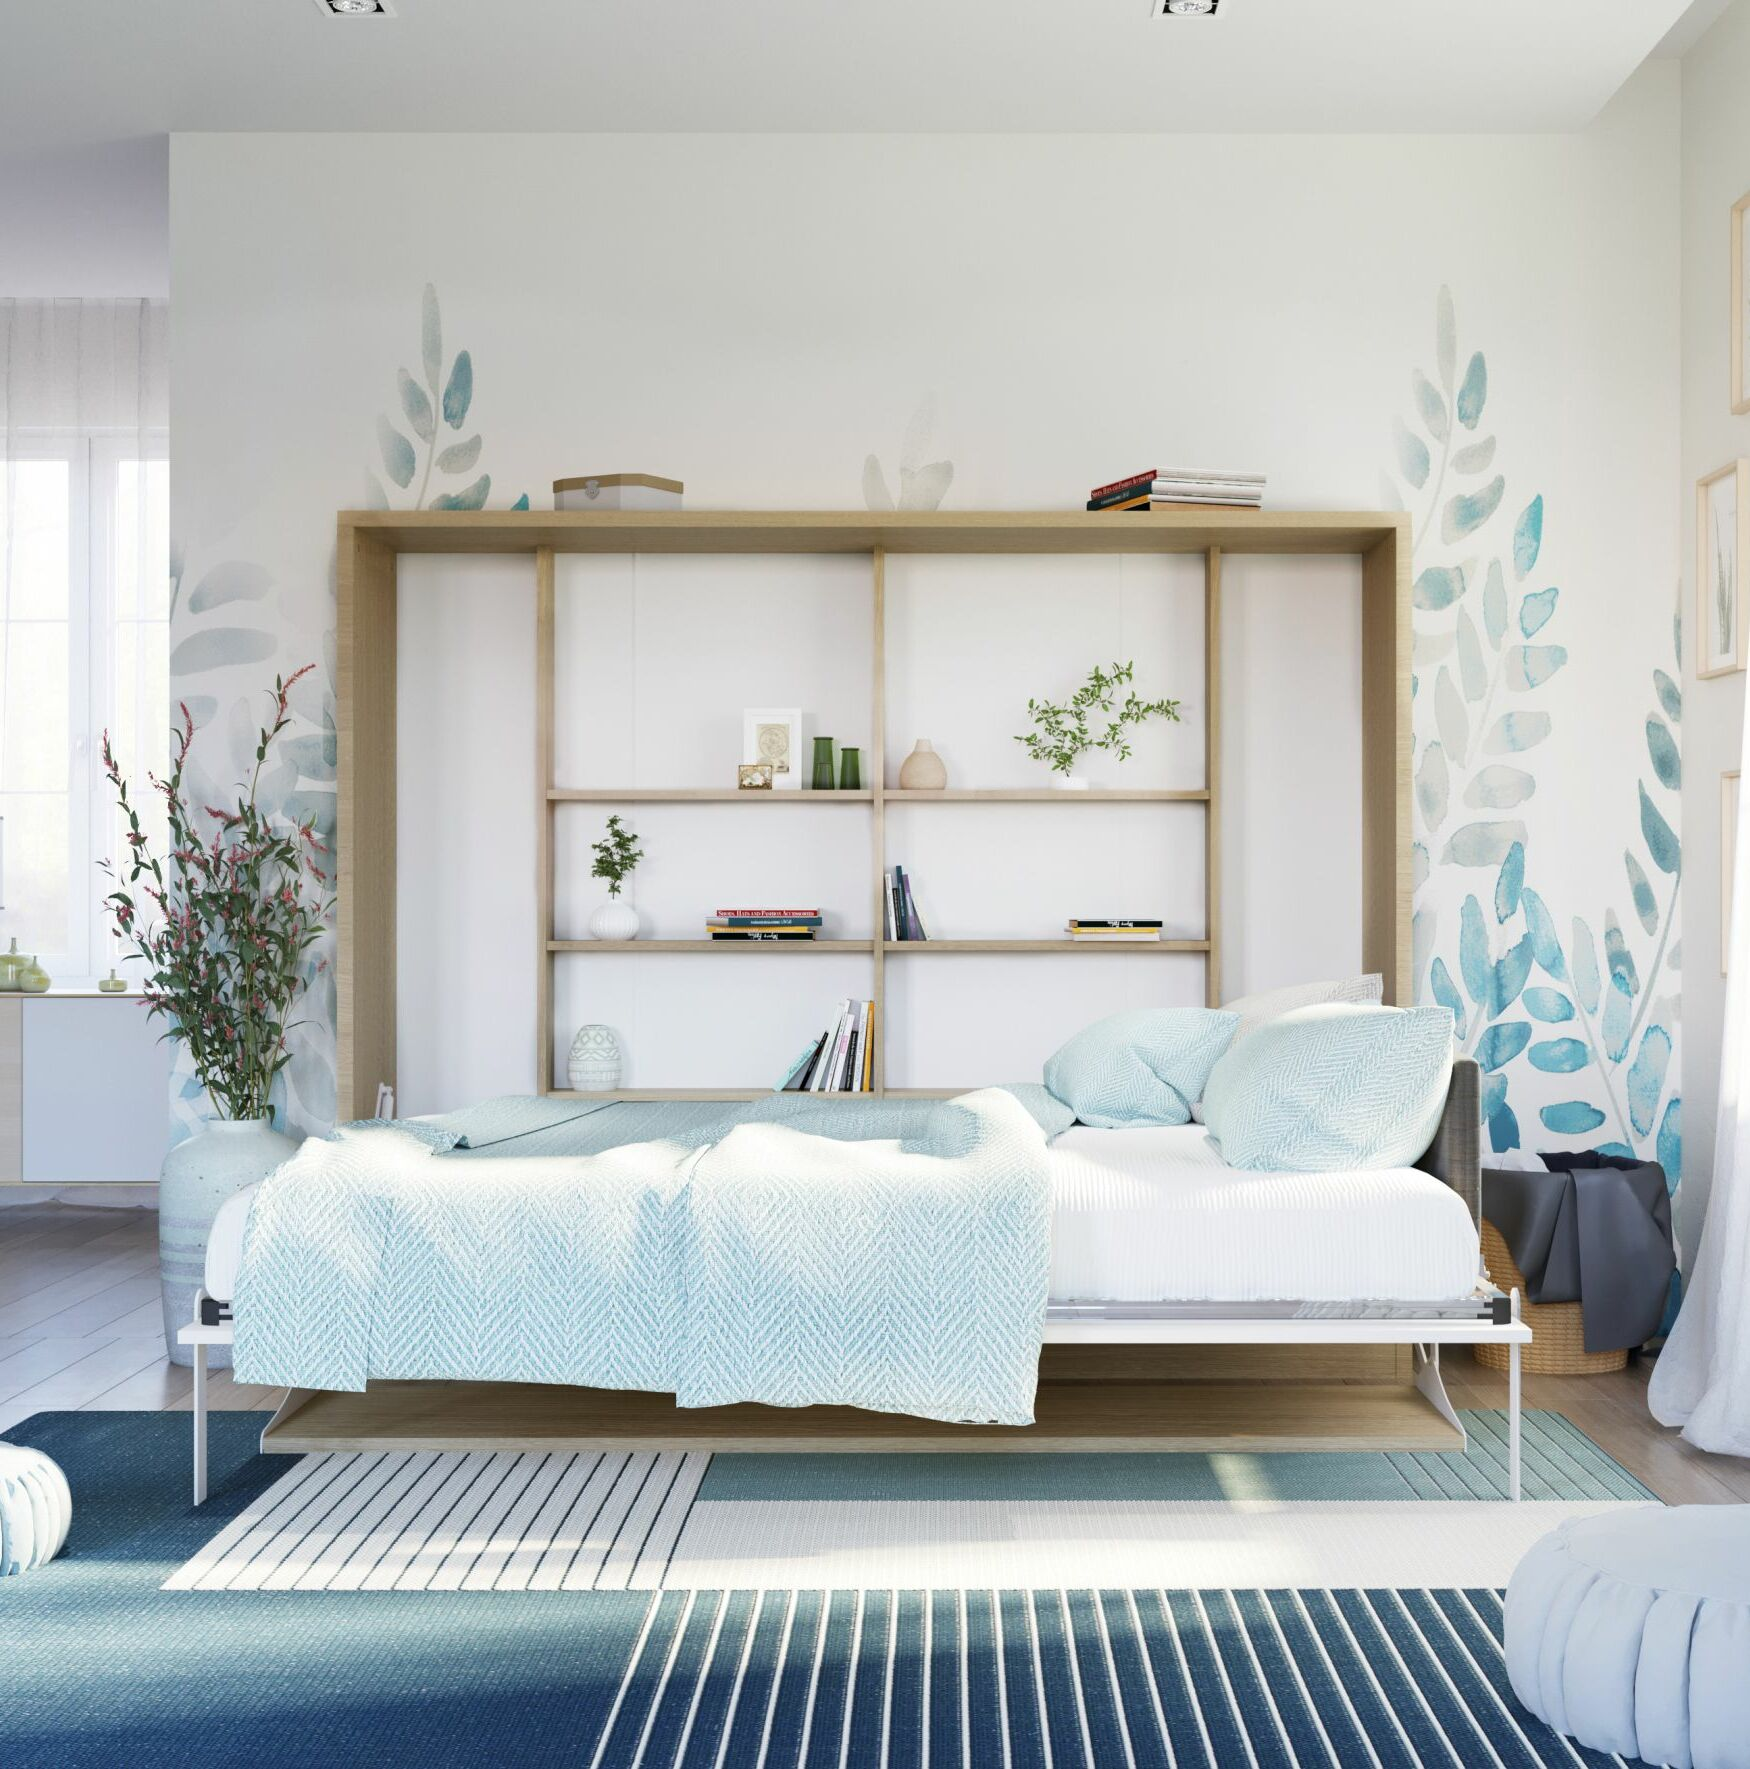 Gautreau Full Murphy Bed with Mattress Color: Semi-Gloss White/Light Wood